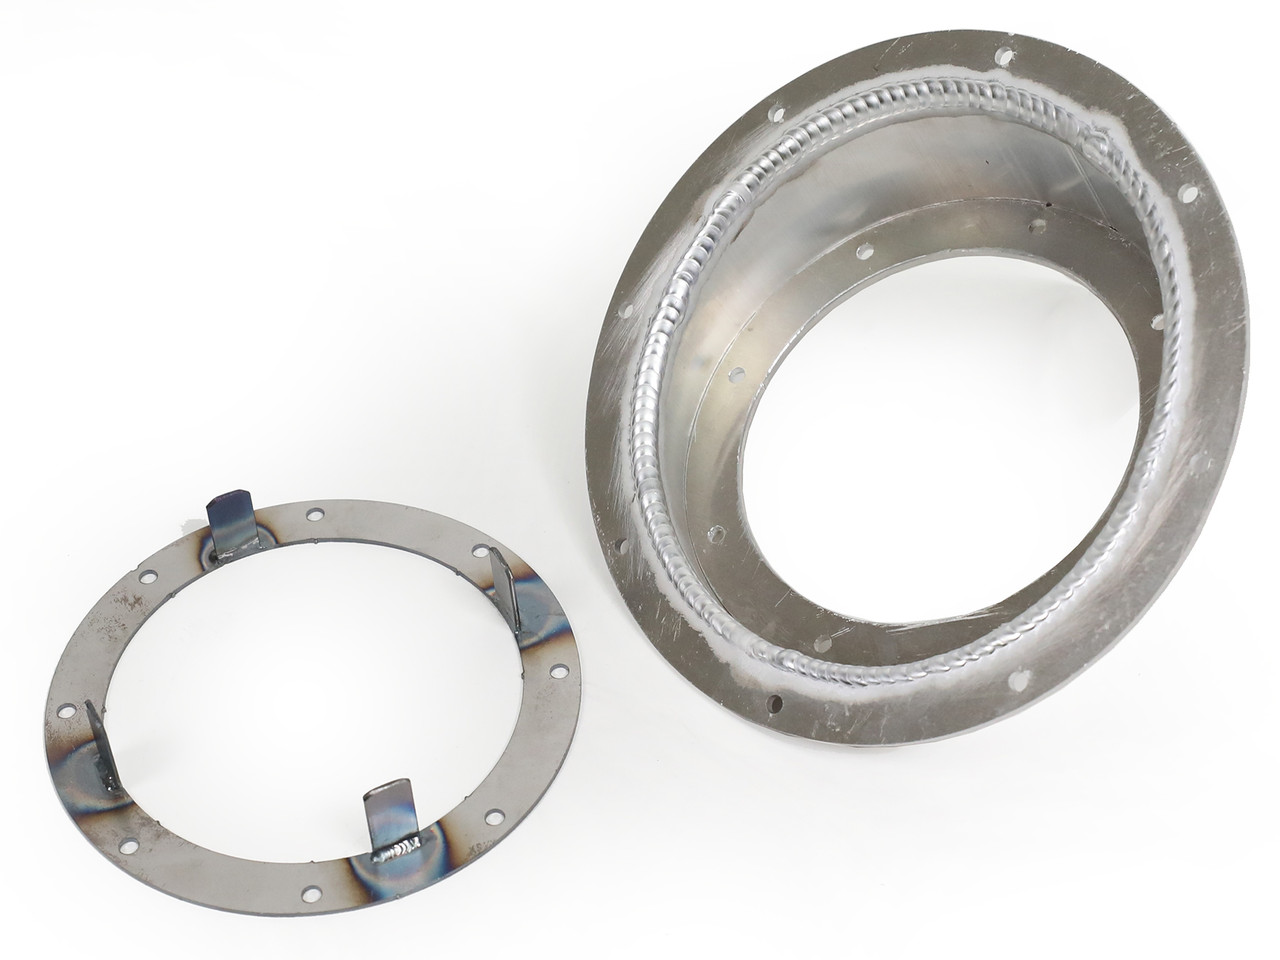 GenRight's aluminum fuel filler bezel